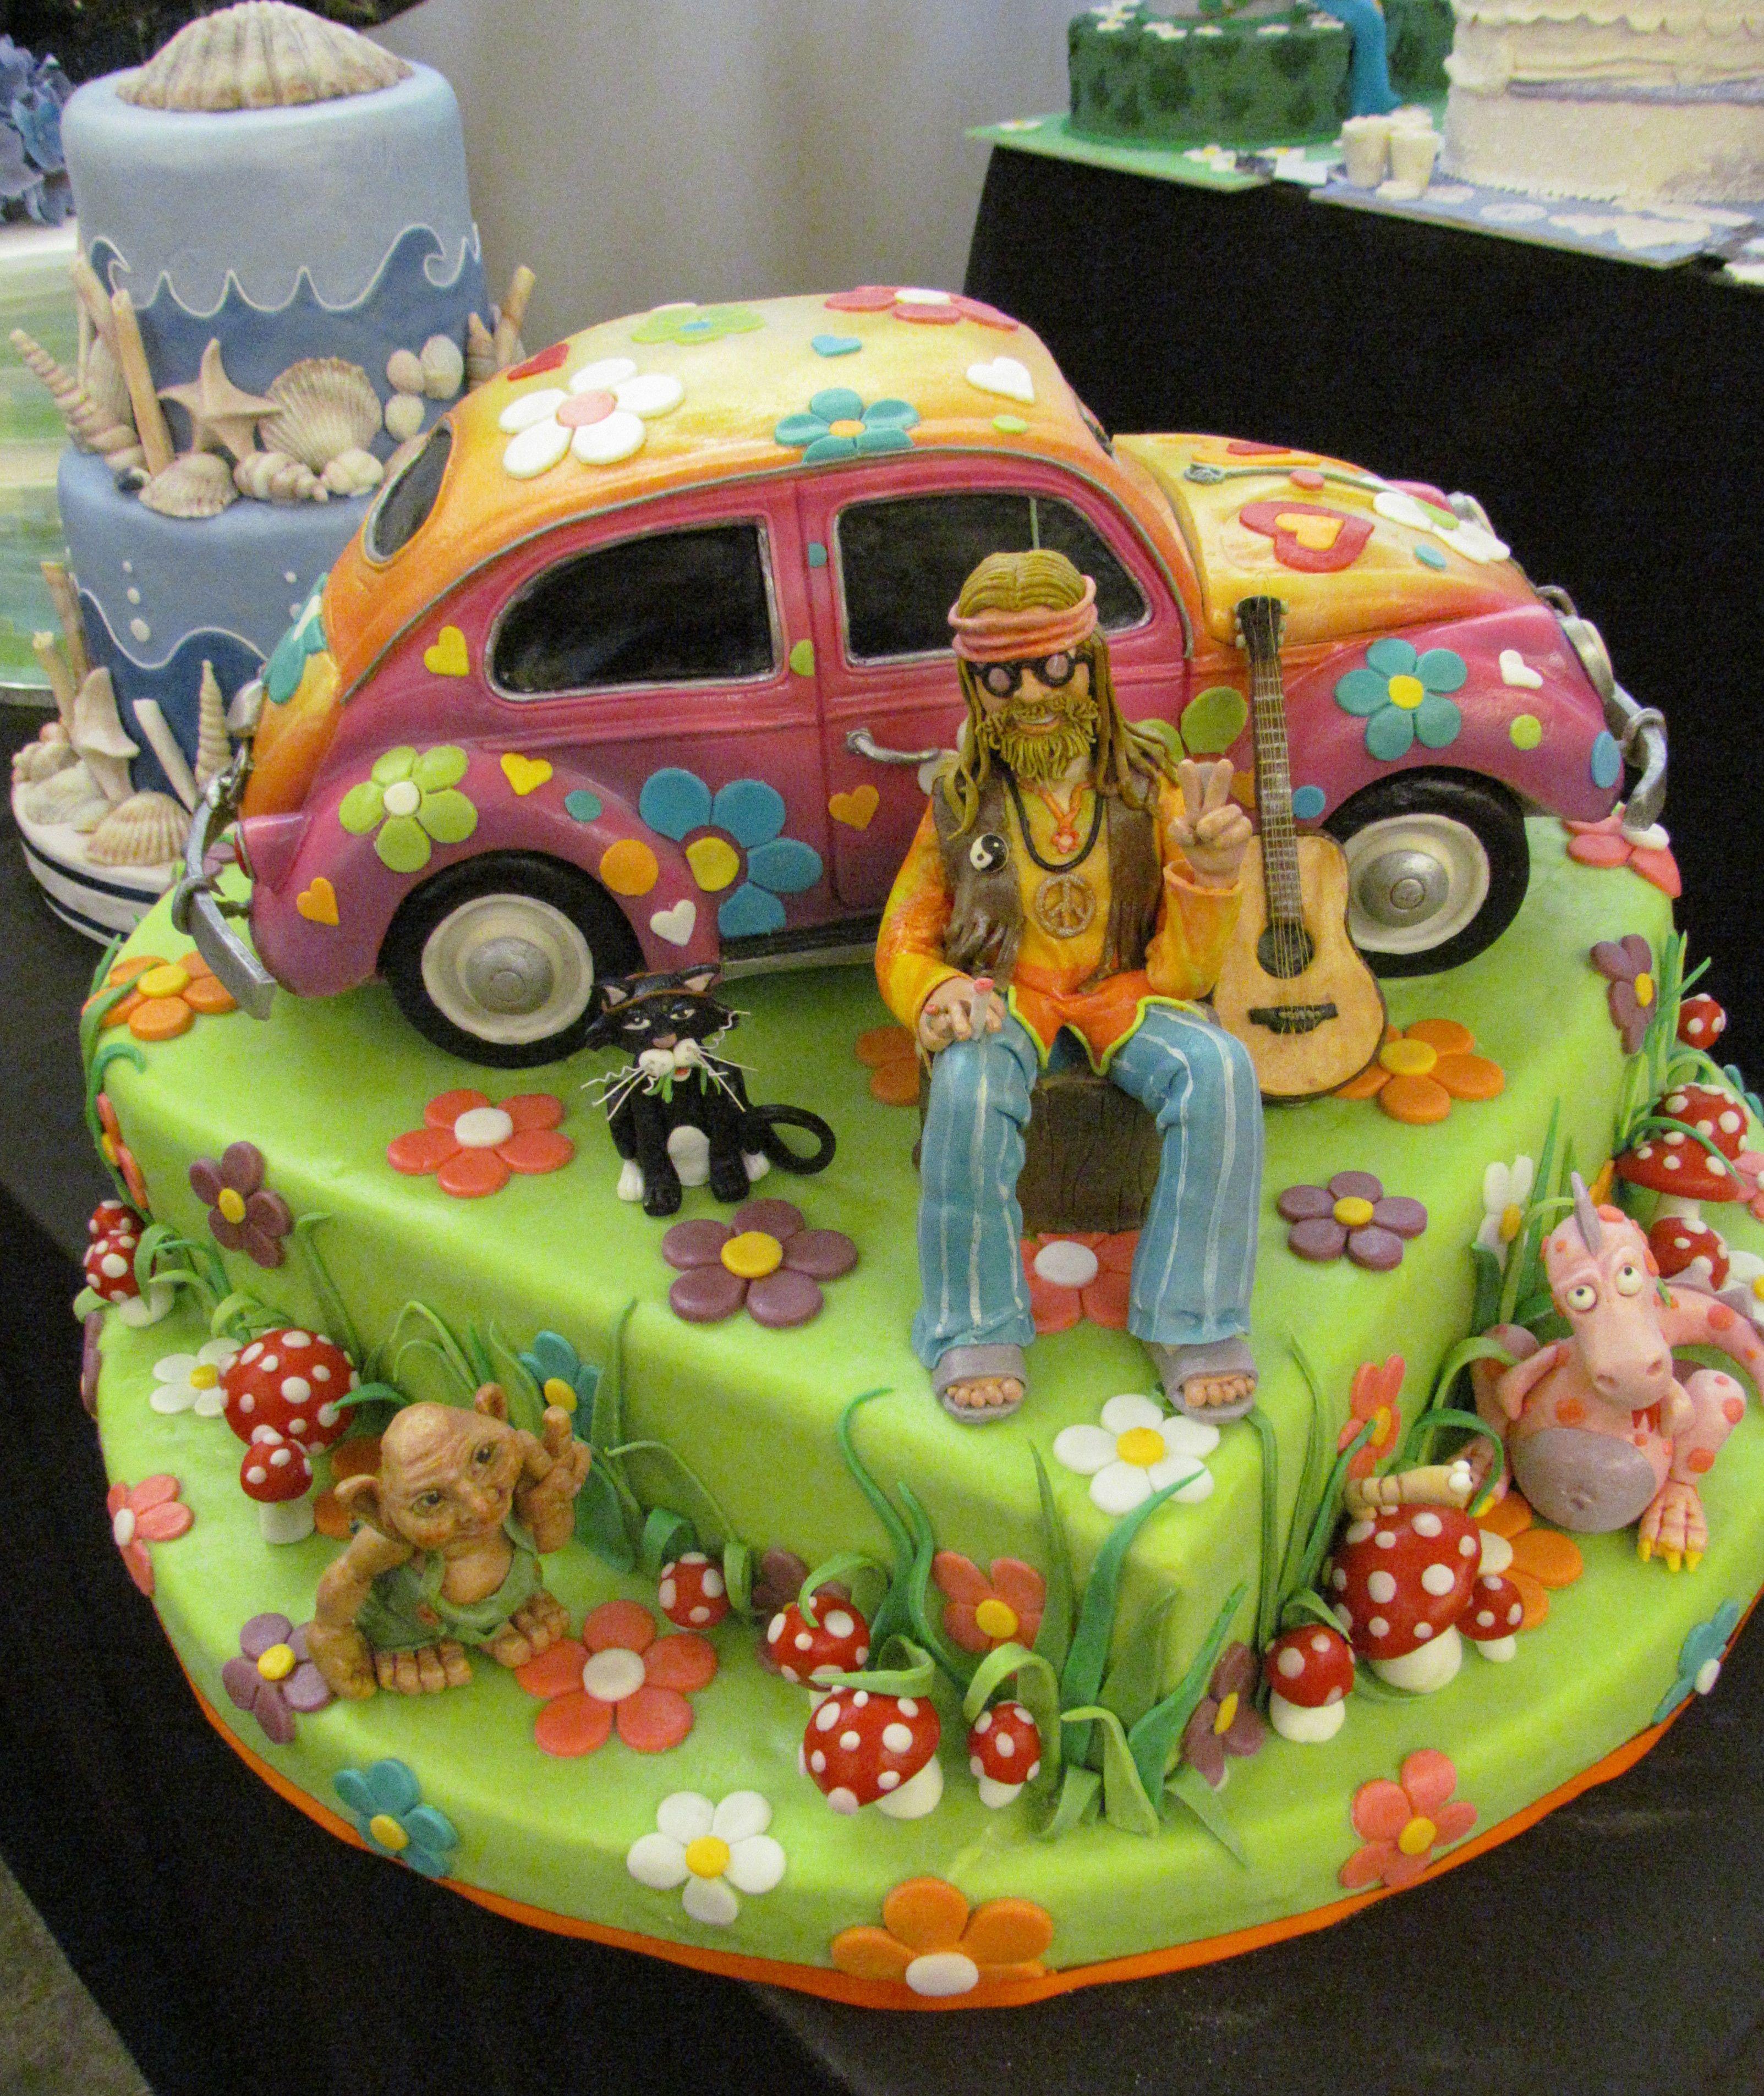 hippy cakes pictures | Hippie Cake Vancouver Designer ...